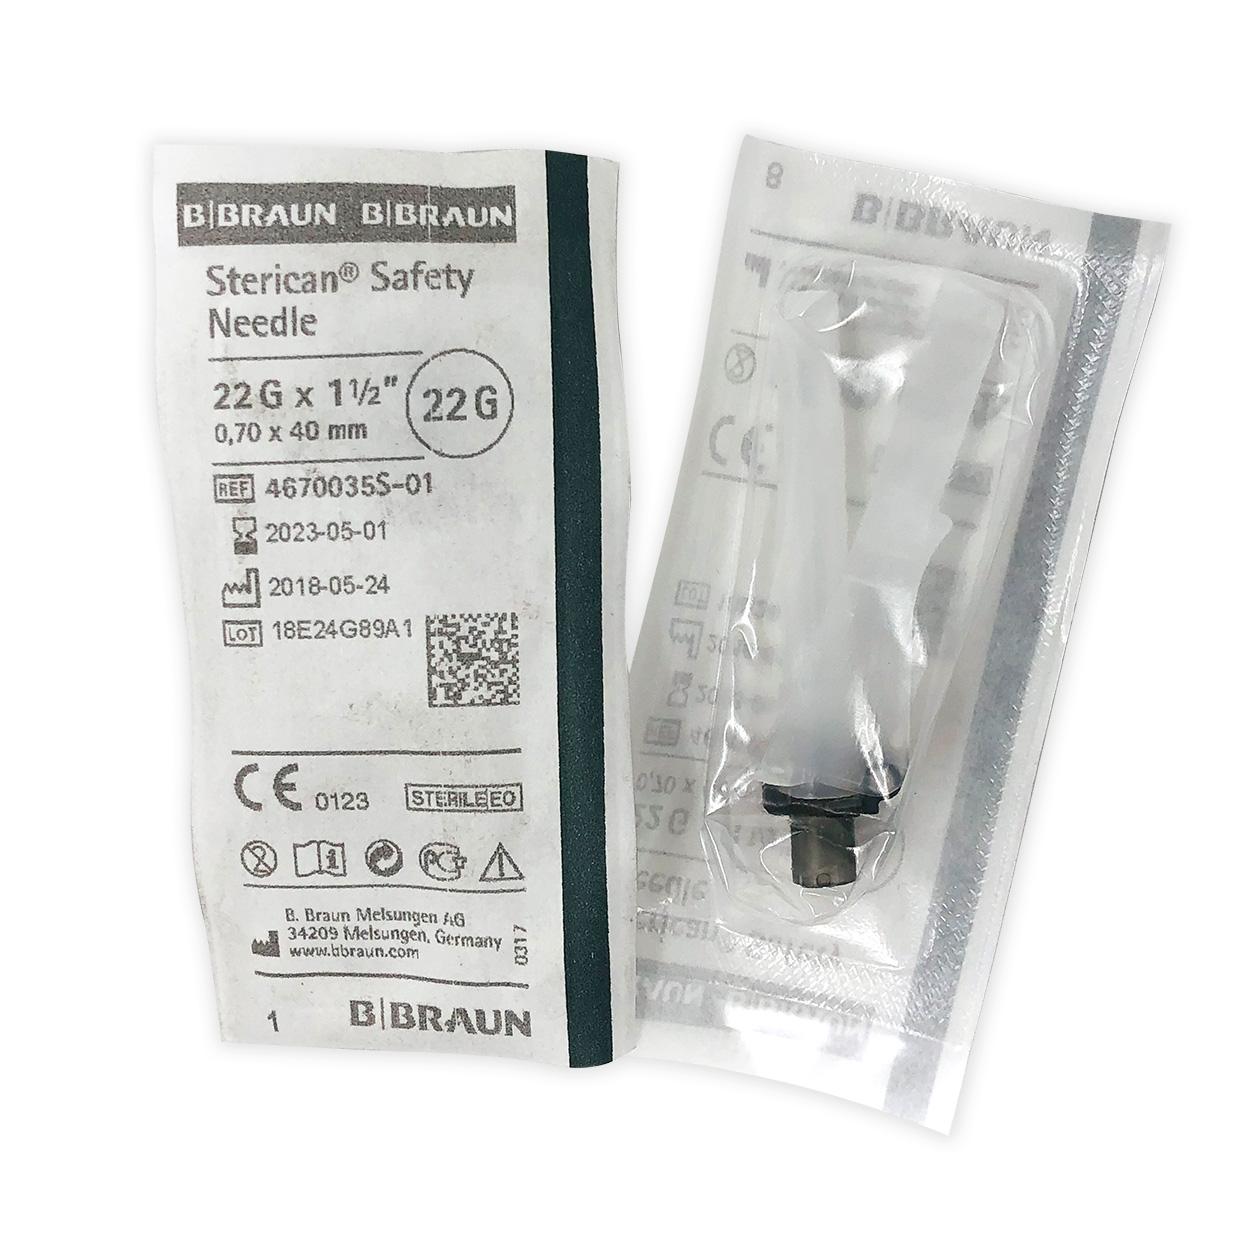 "Sicherheitskanülen Sol-Care 21 G 1 1/2"" | 0,7 x 40 mm grau - Packung à 100 Stück"